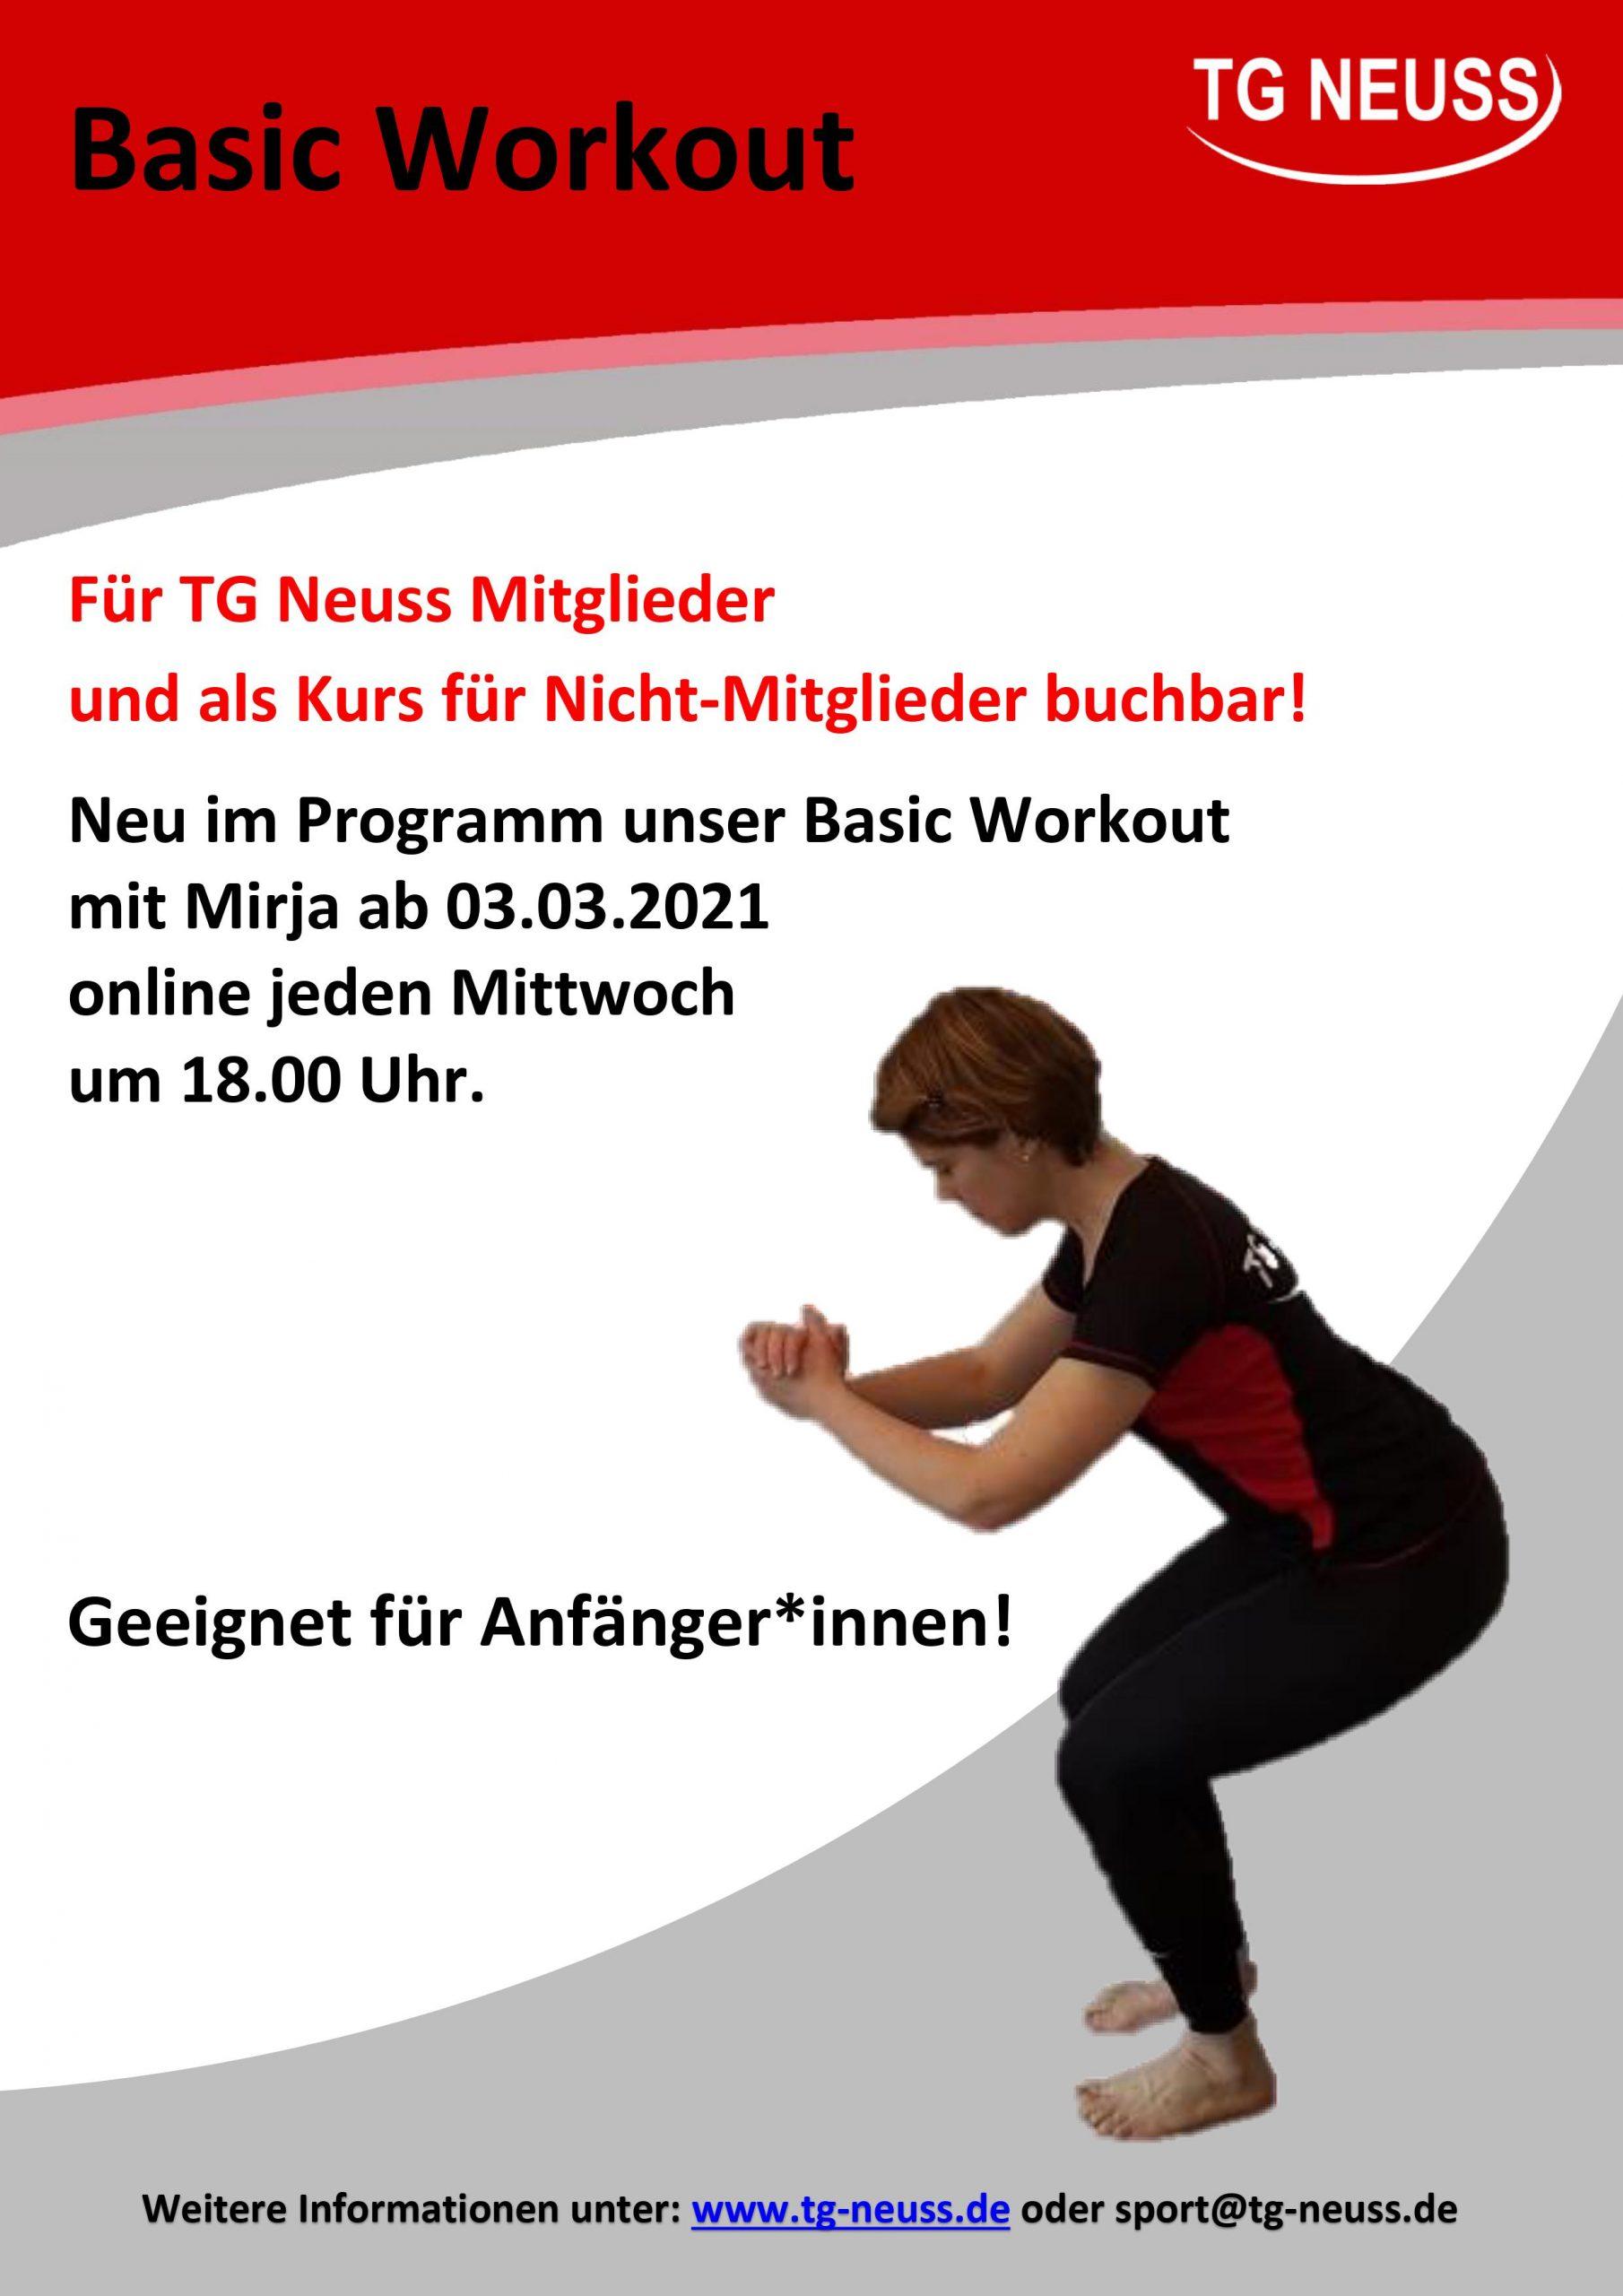 Basic Workout